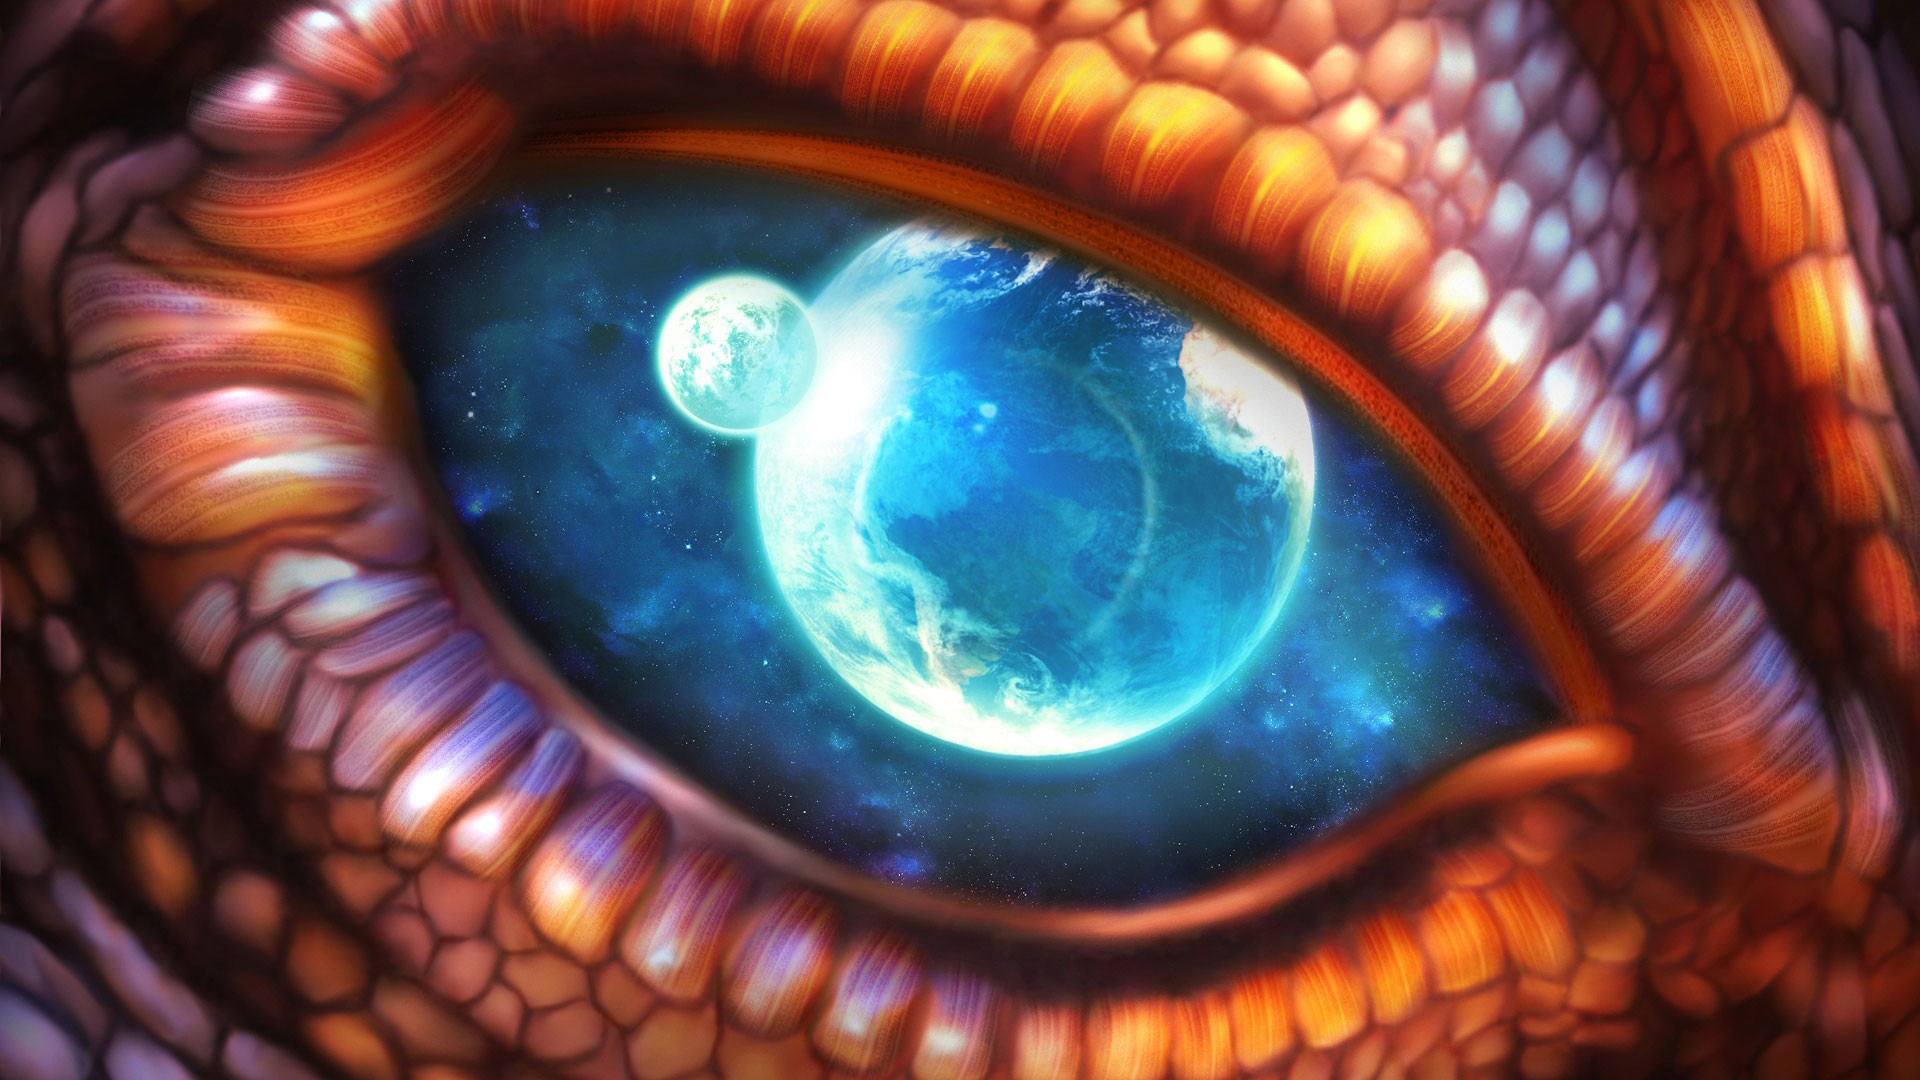 hd pics photos beautiful dragon eye close up animals planets hd quality  desktop background wallpaper